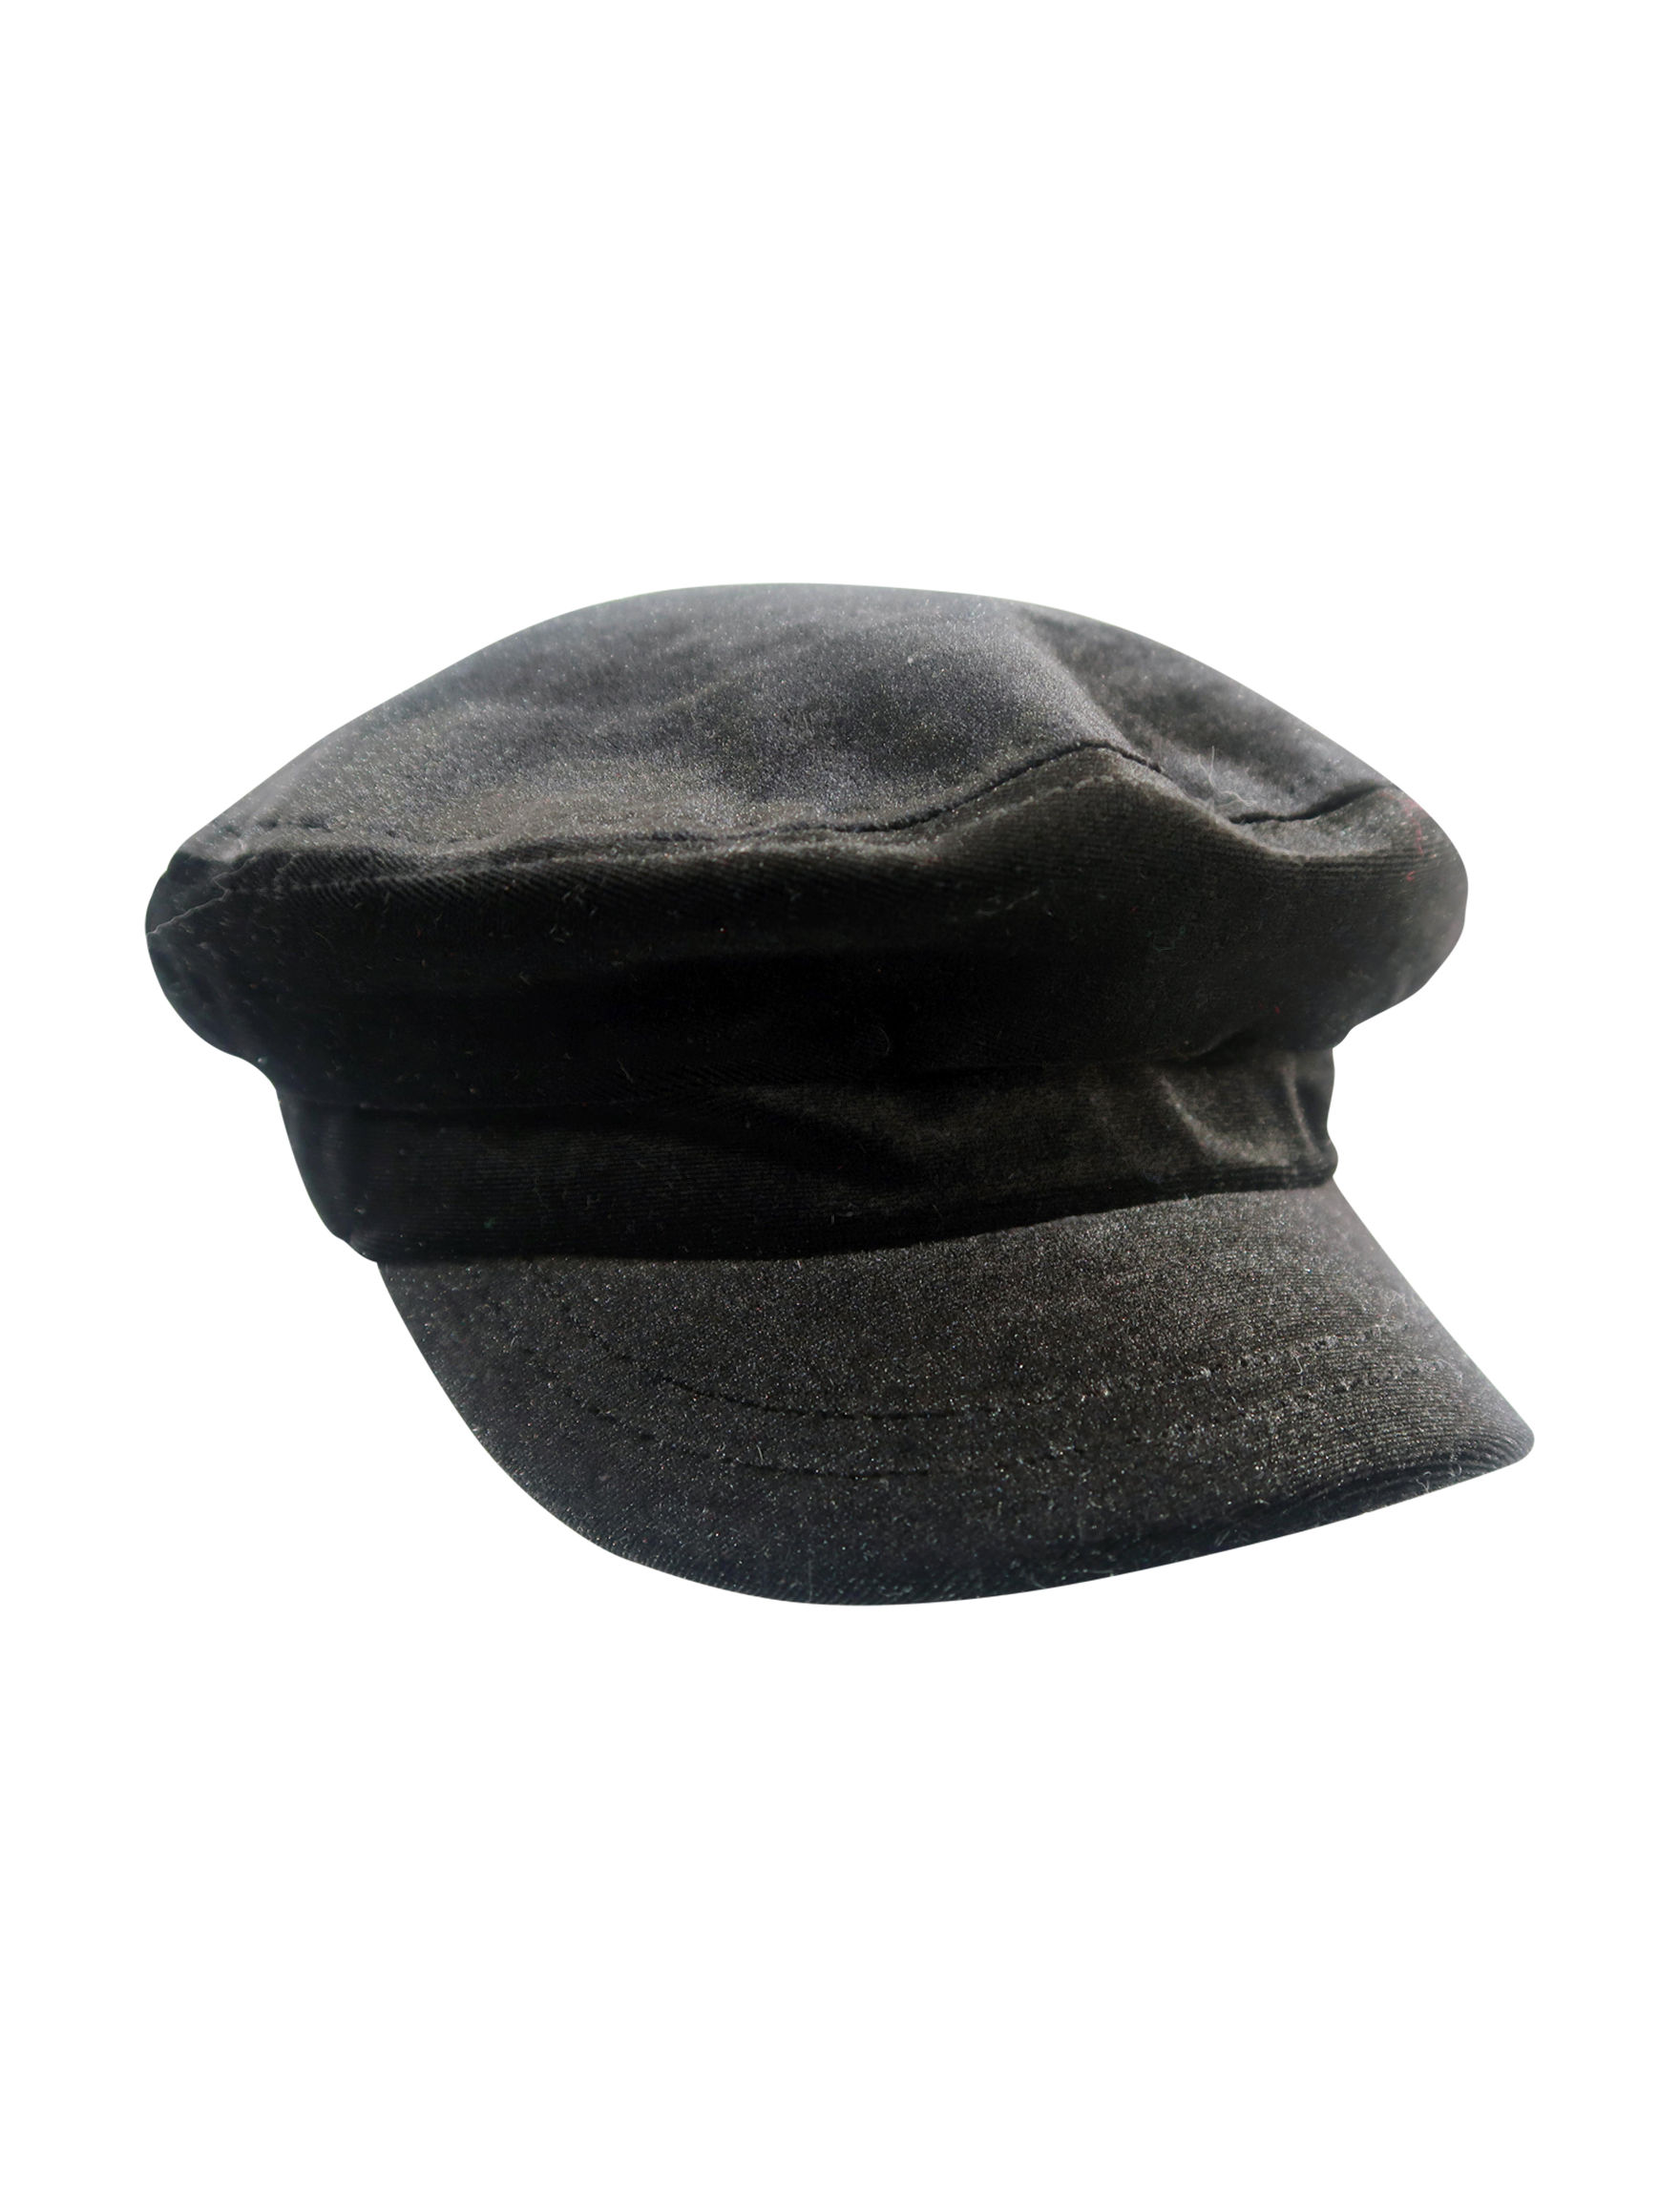 Marcus Adler Black Hats & Headwear